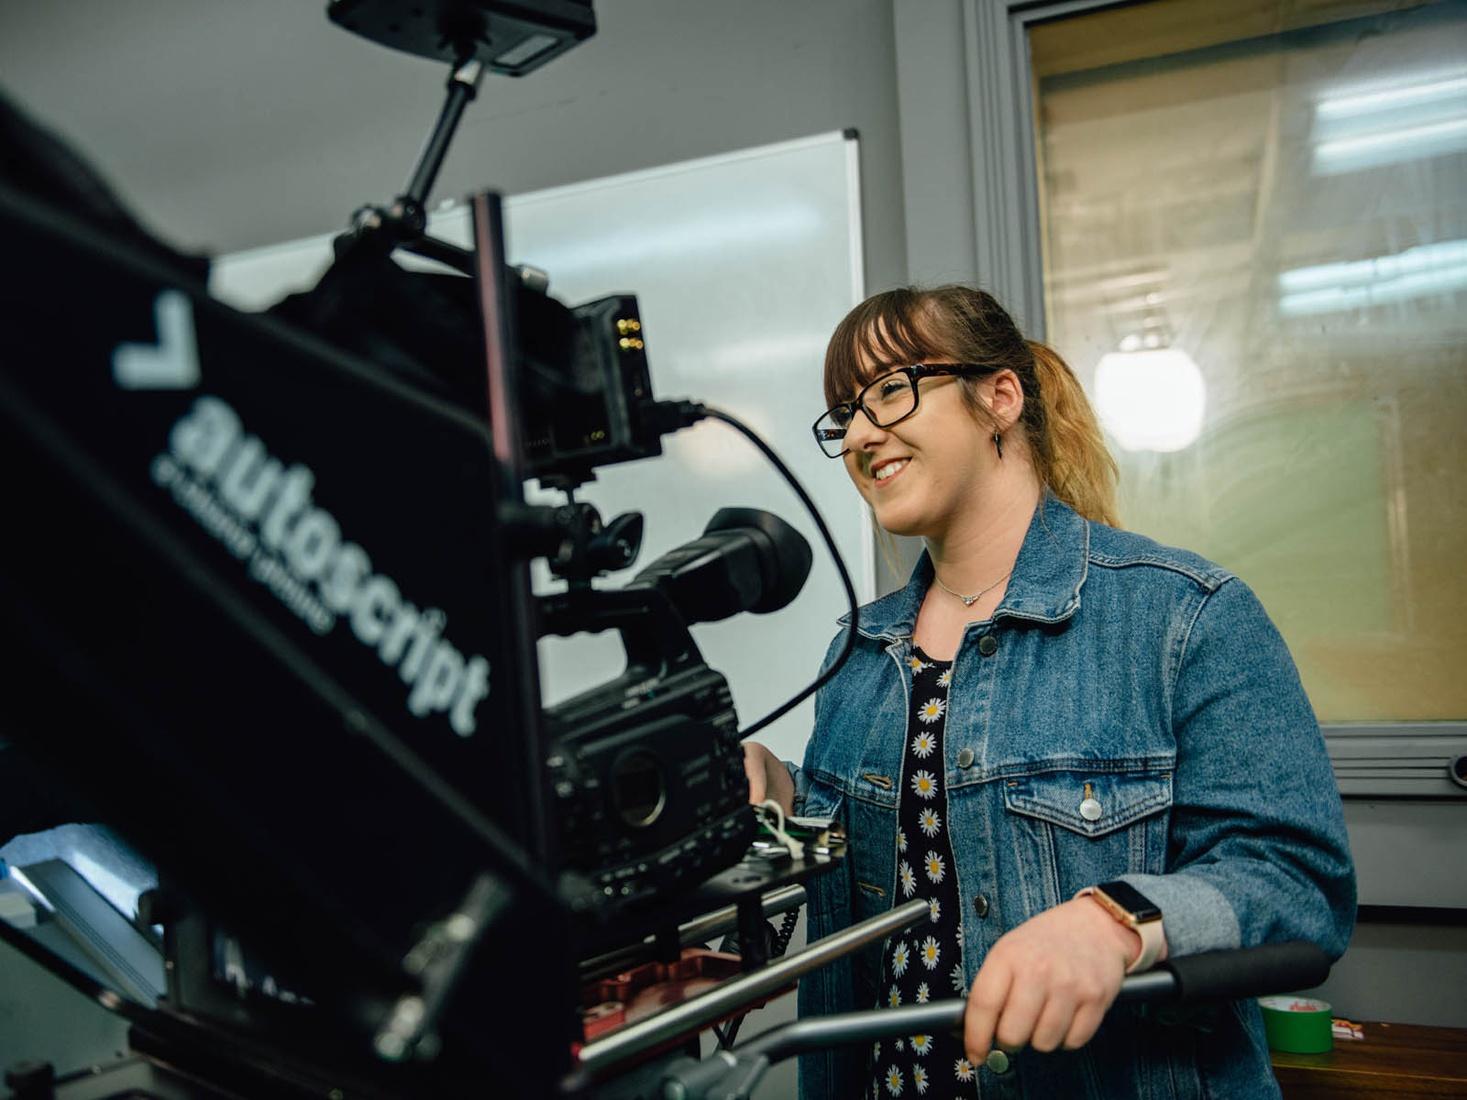 Student using film camera